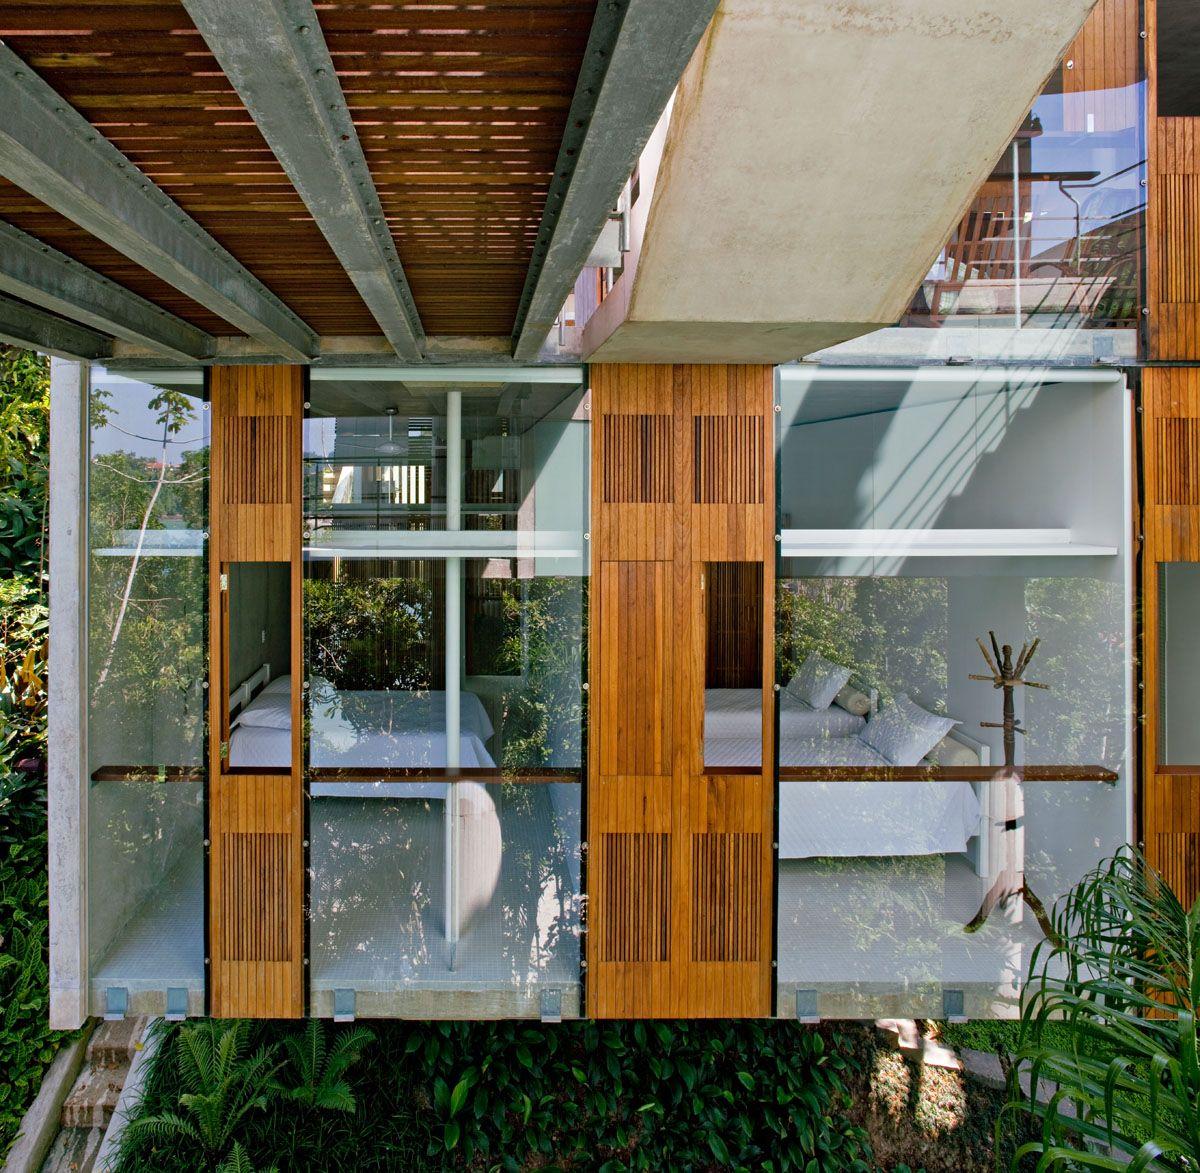 House in Ubatuba, Brazil by SPBR Arquitetos